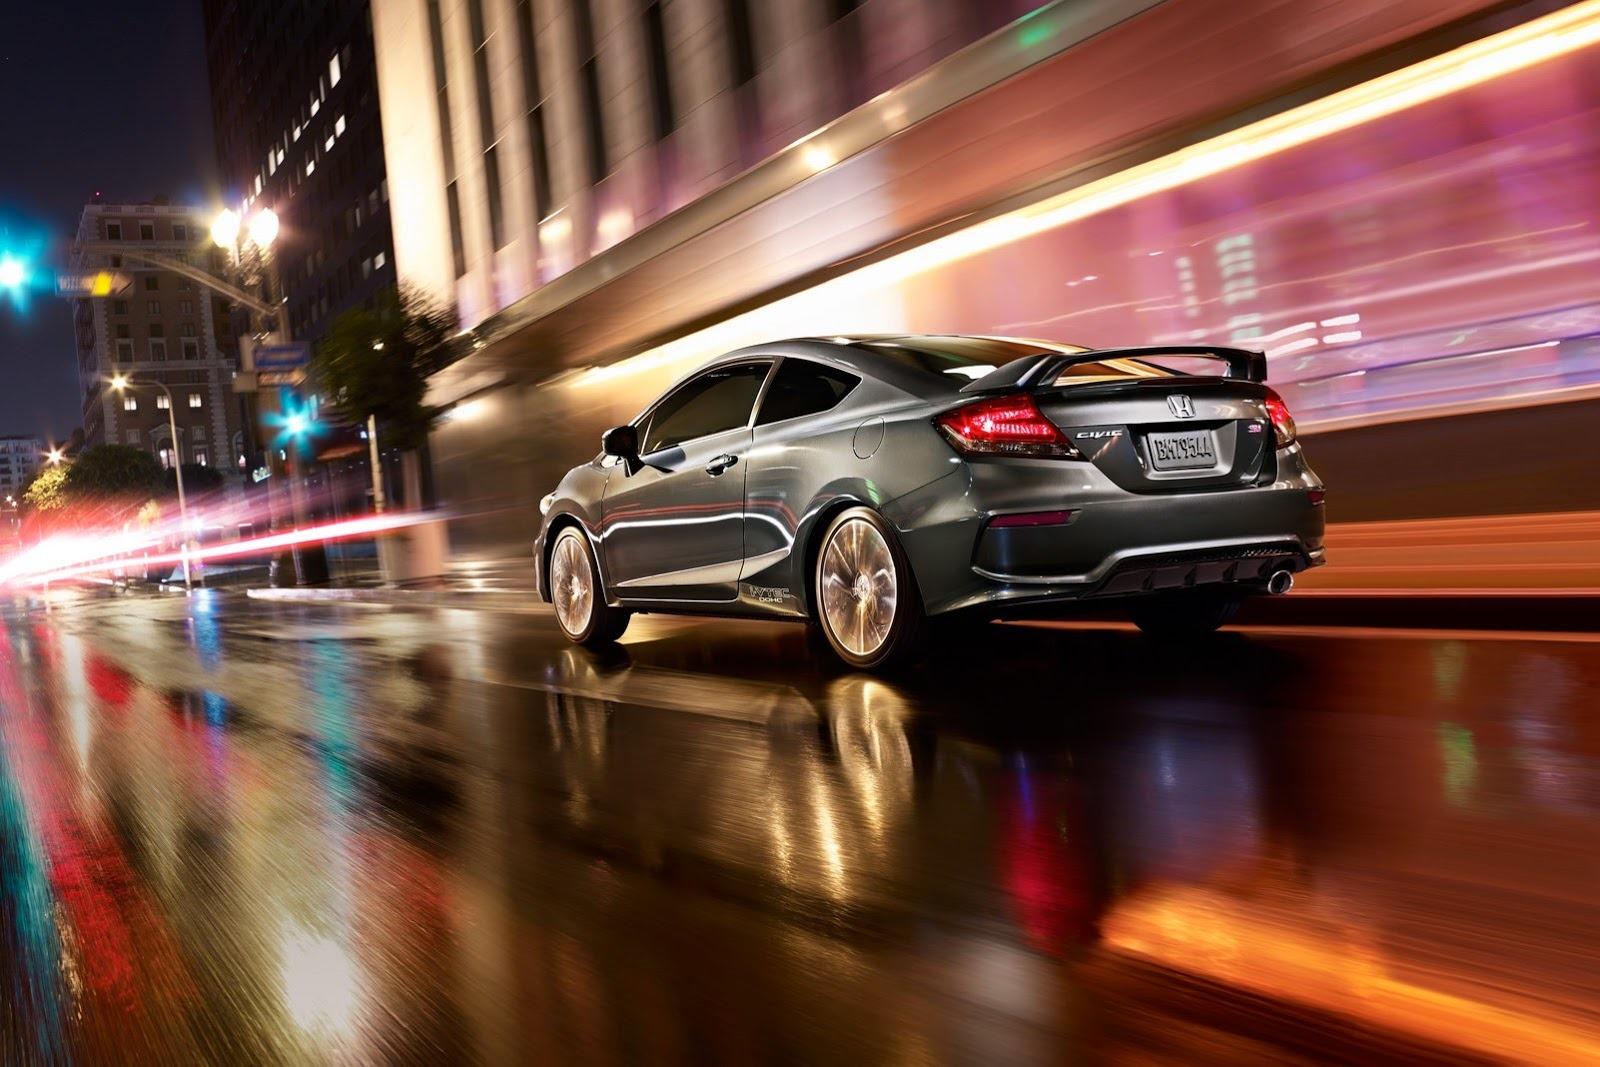 2014-Honda-Civic-Coupe-2[2].jpg